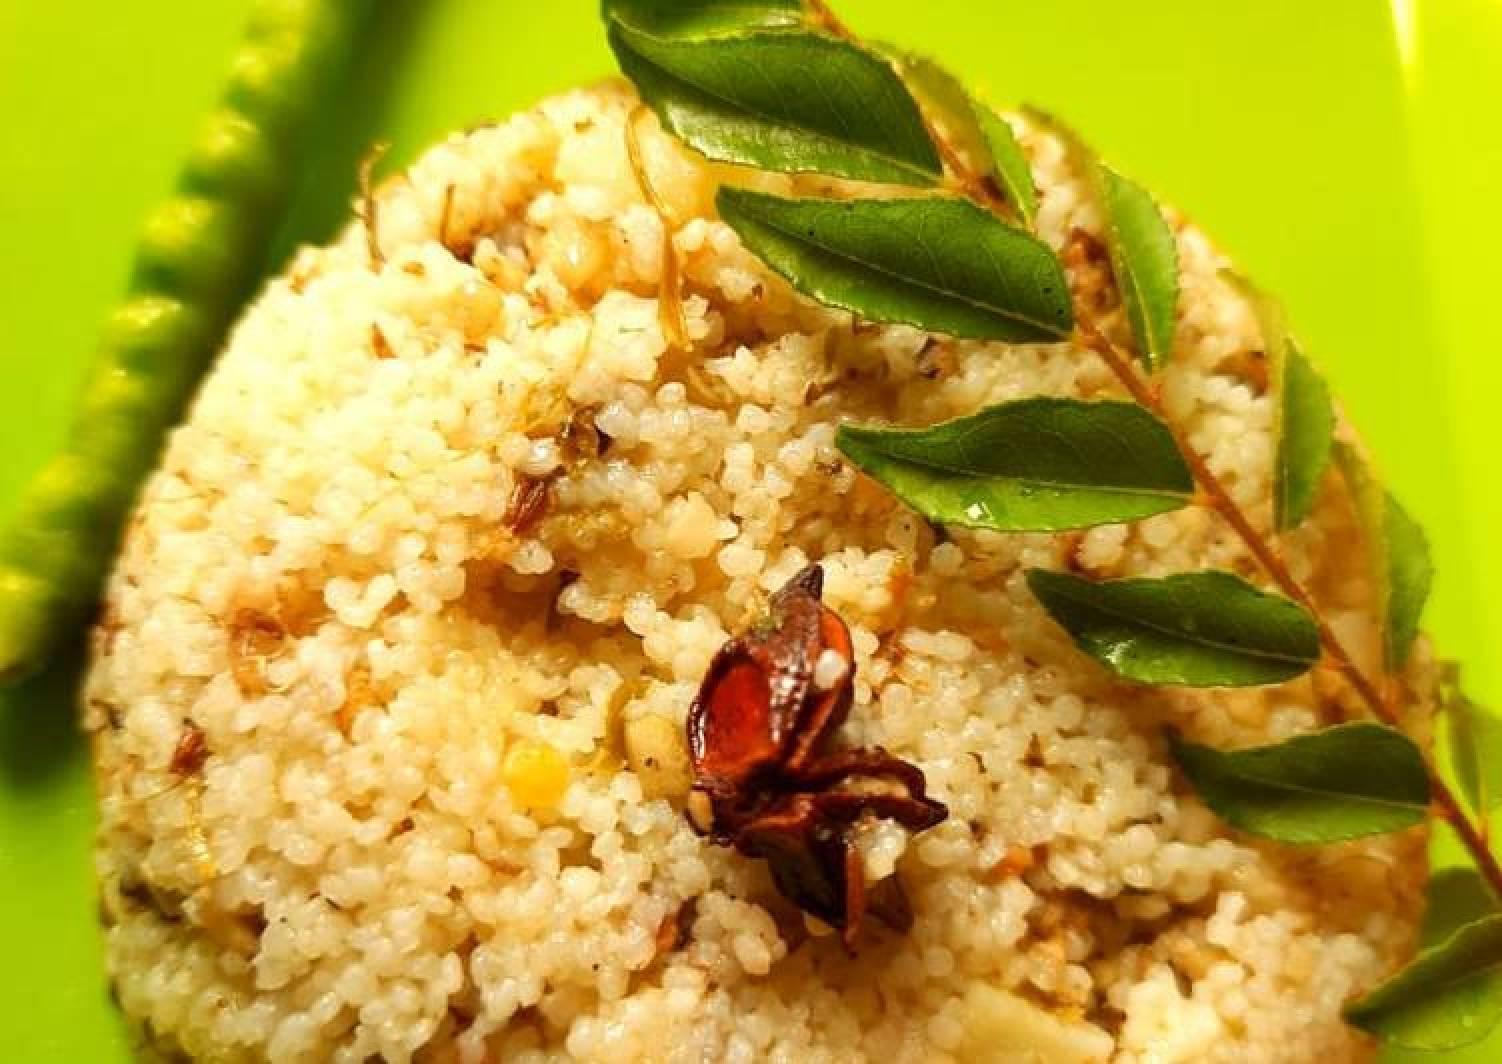 Samak rice khichdi